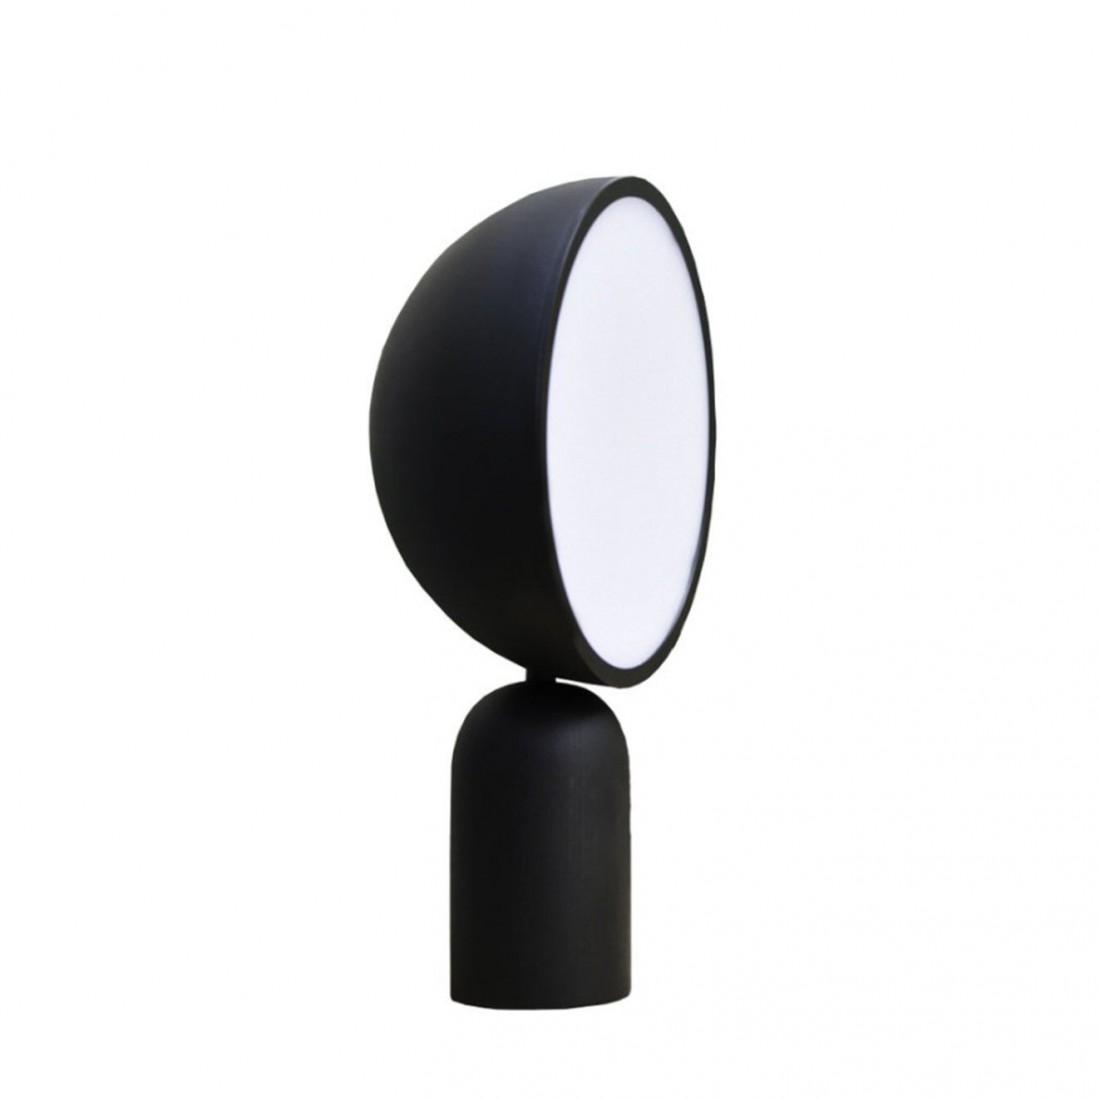 Lampe à poser ATLAS Noir Eno Studio